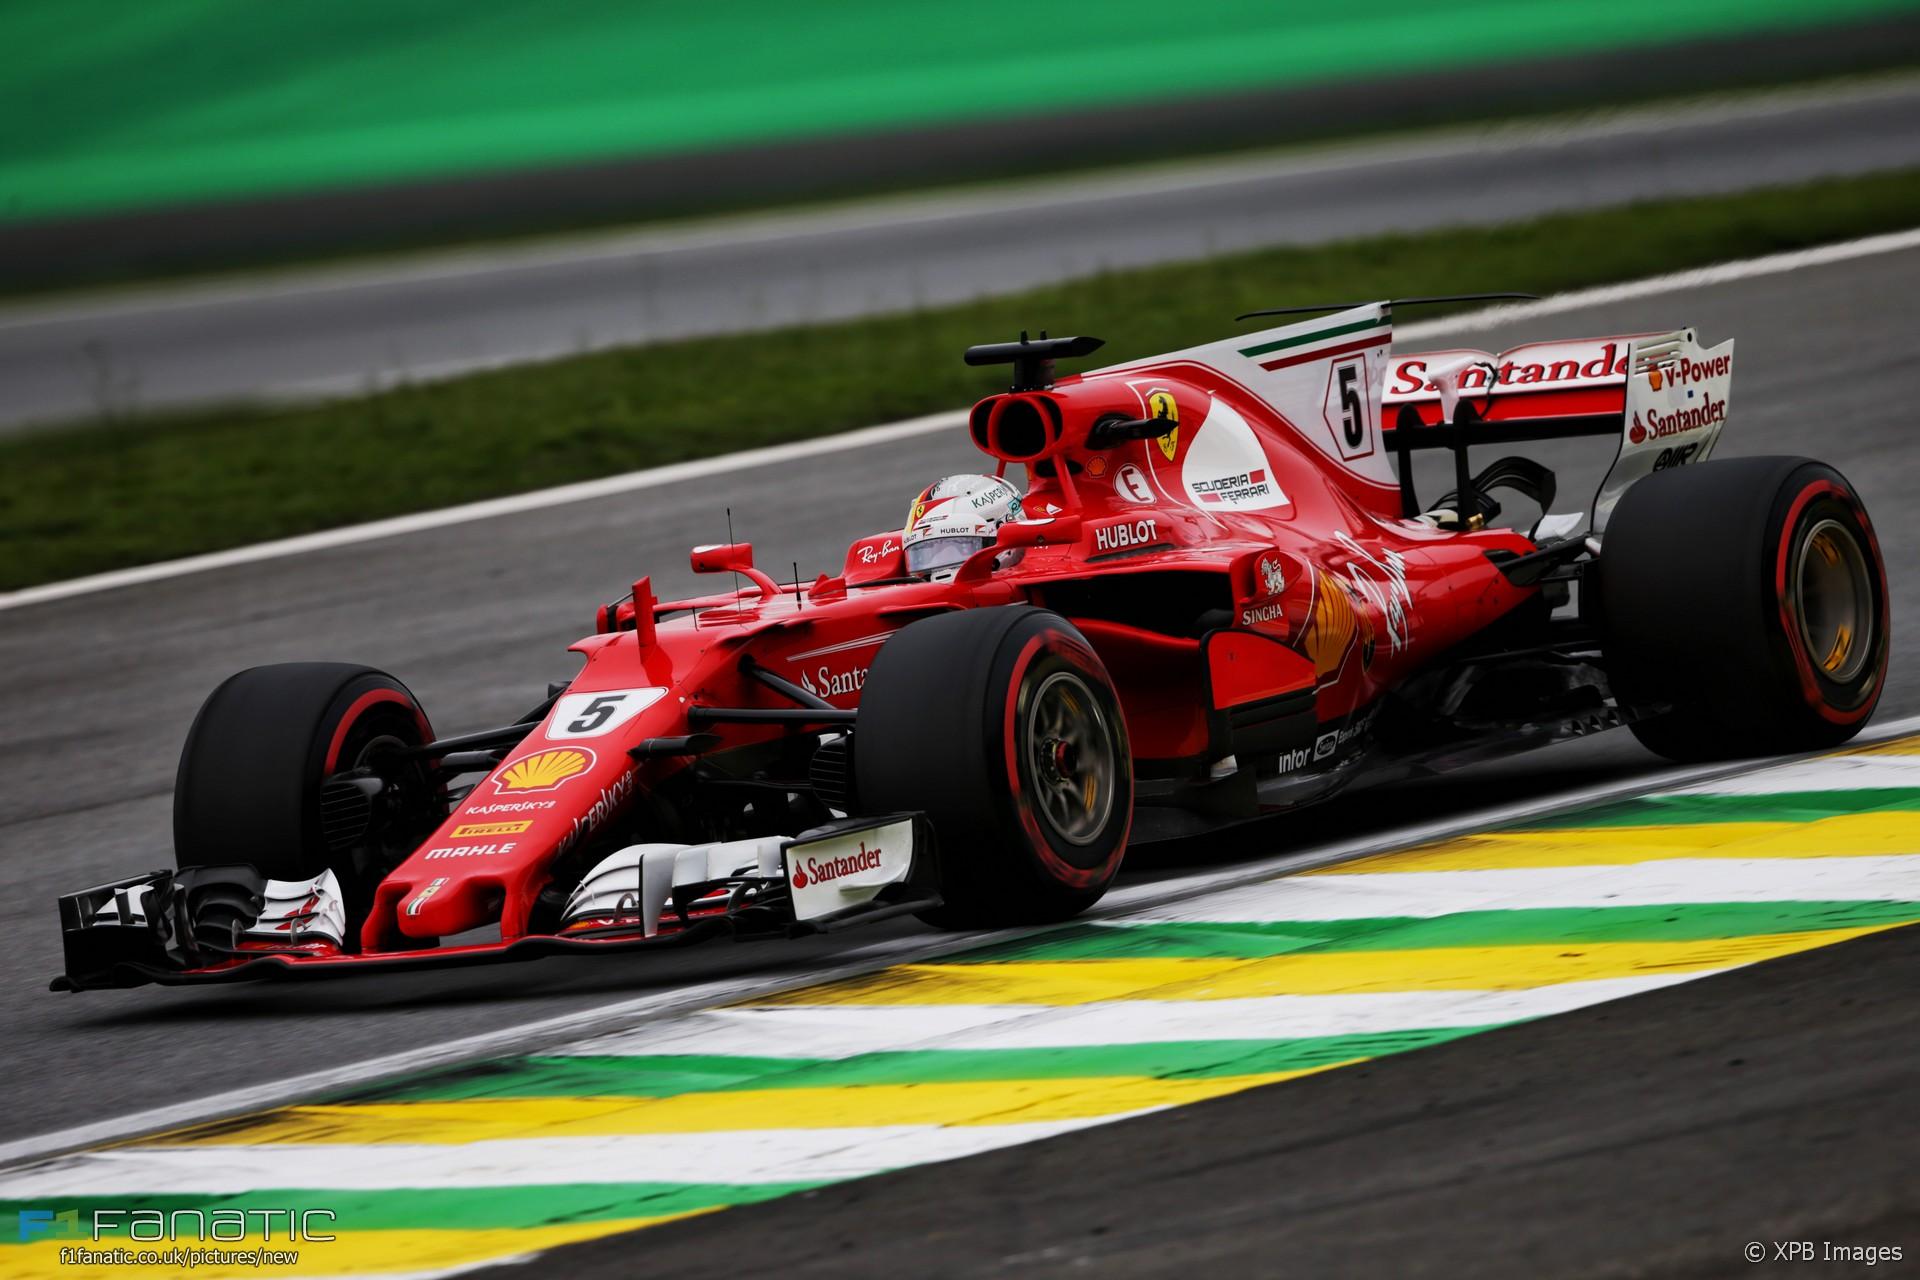 Sebastian Vettel, Ferrari, Interlagos, 2017